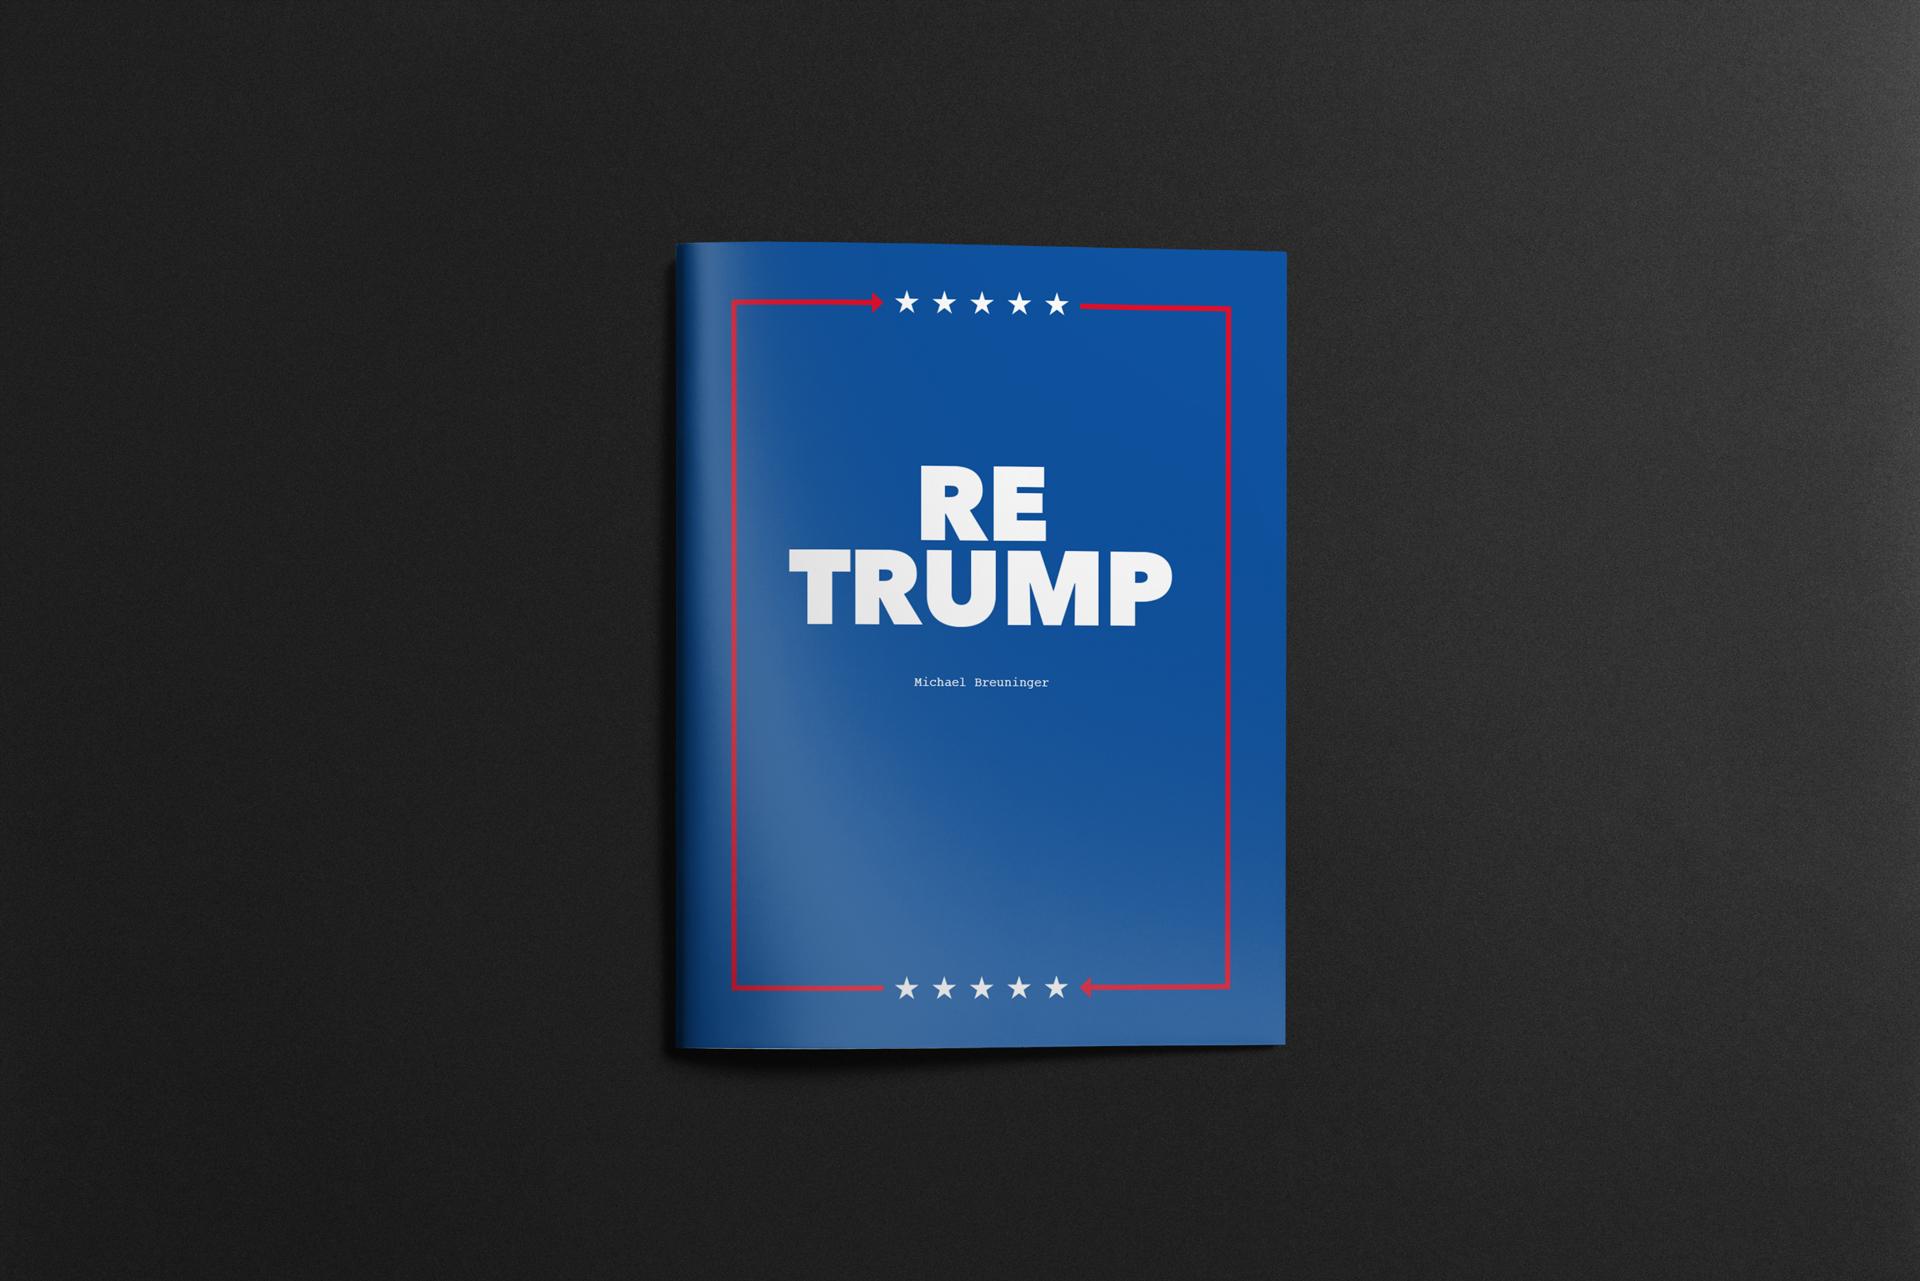 ReTrump